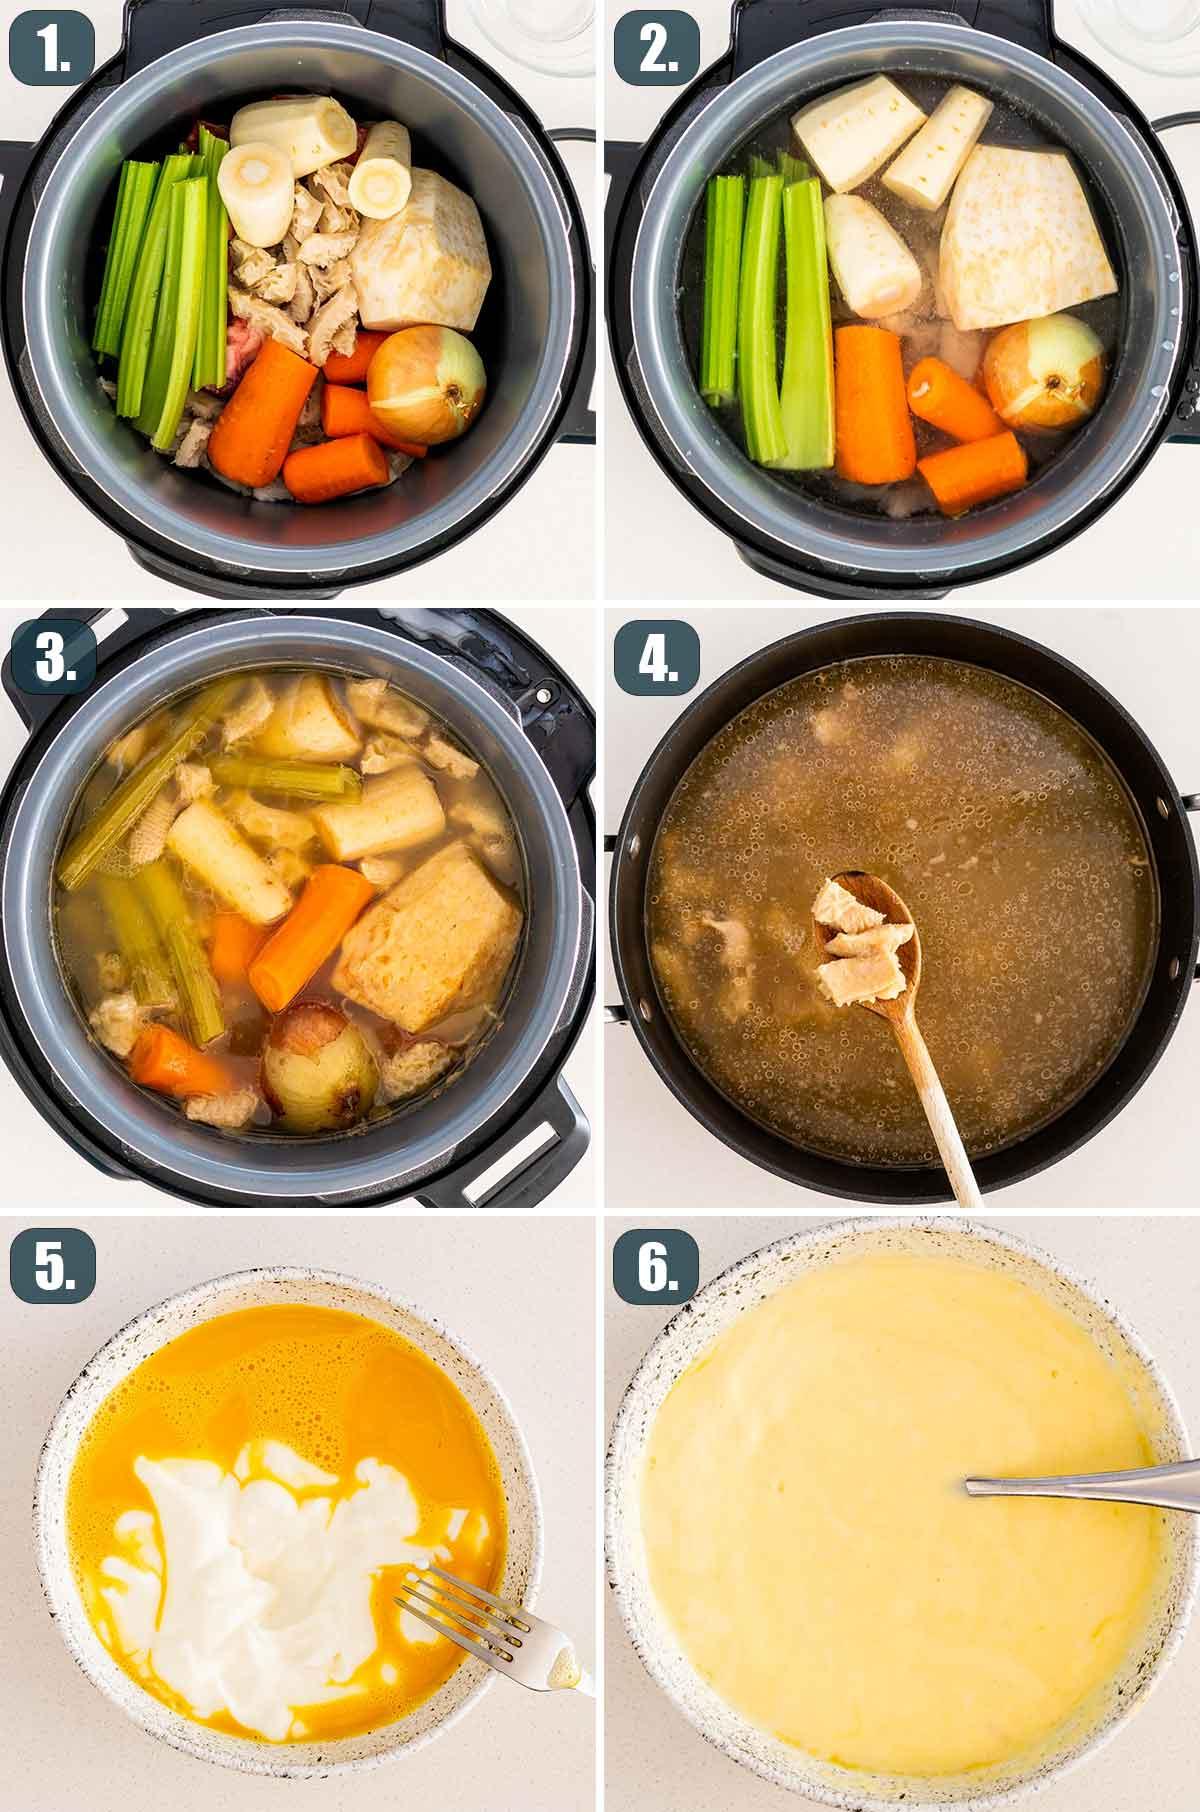 process shots showing how to make tripe soup.